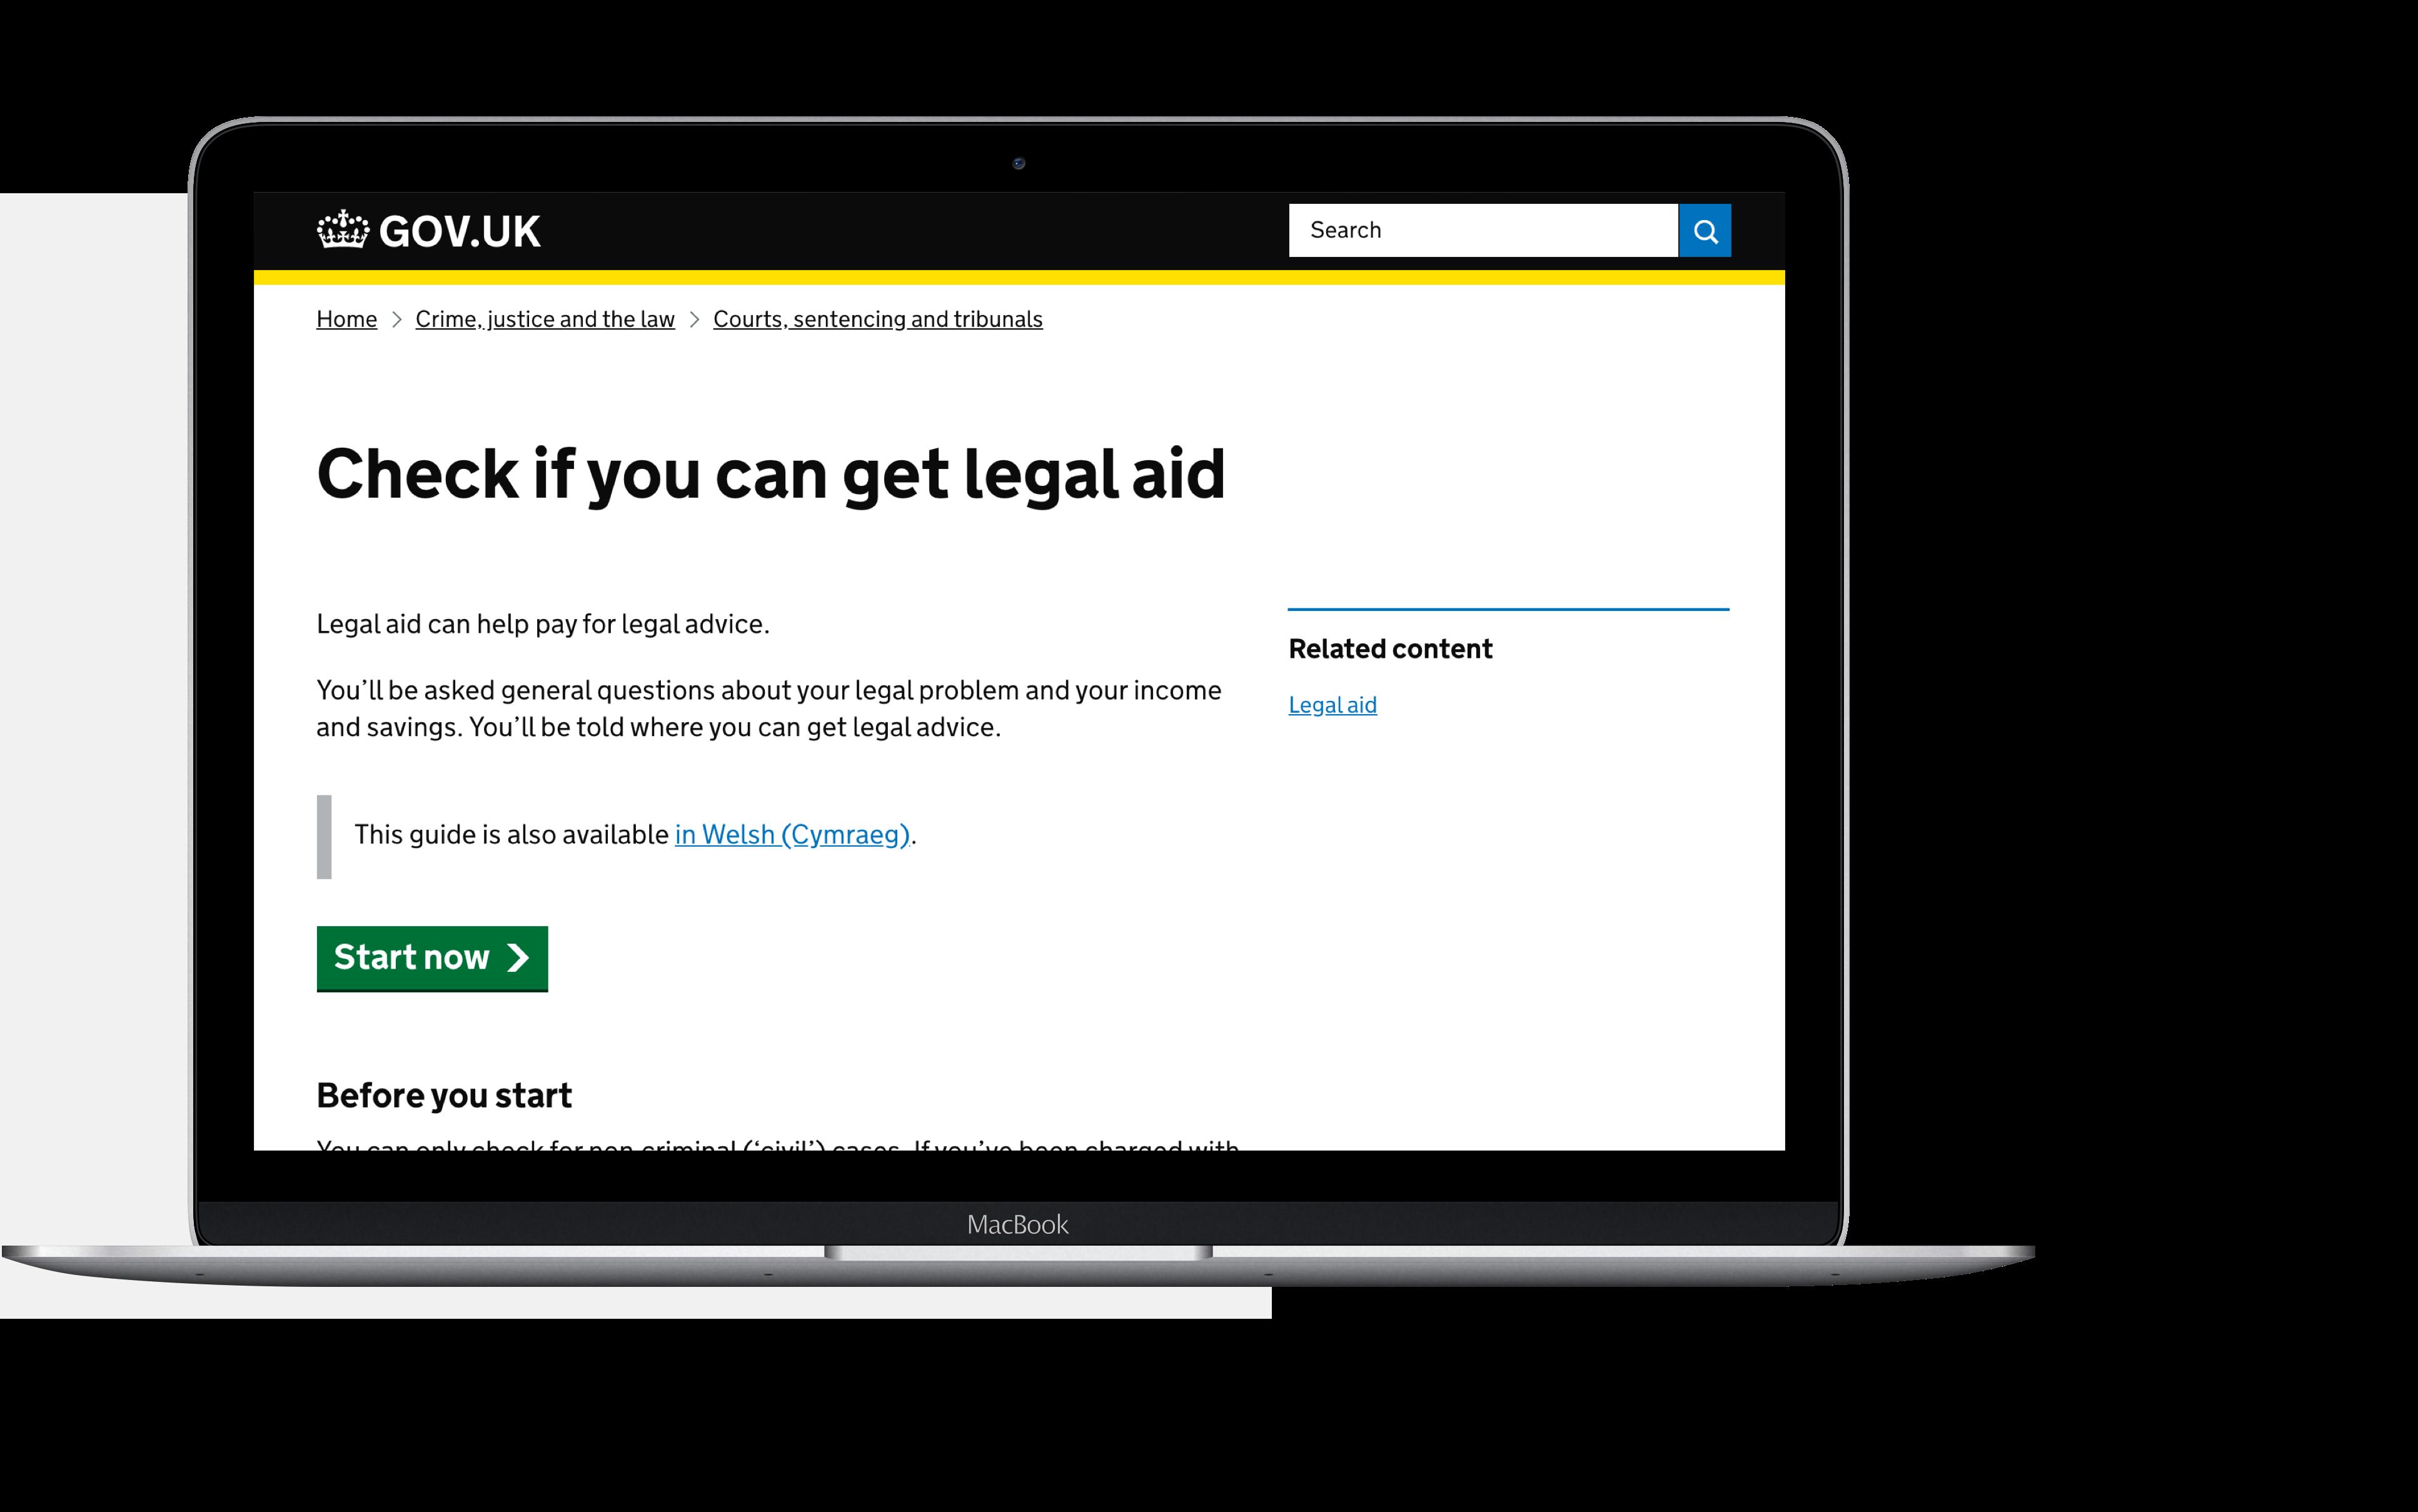 Legal aid agency laptop